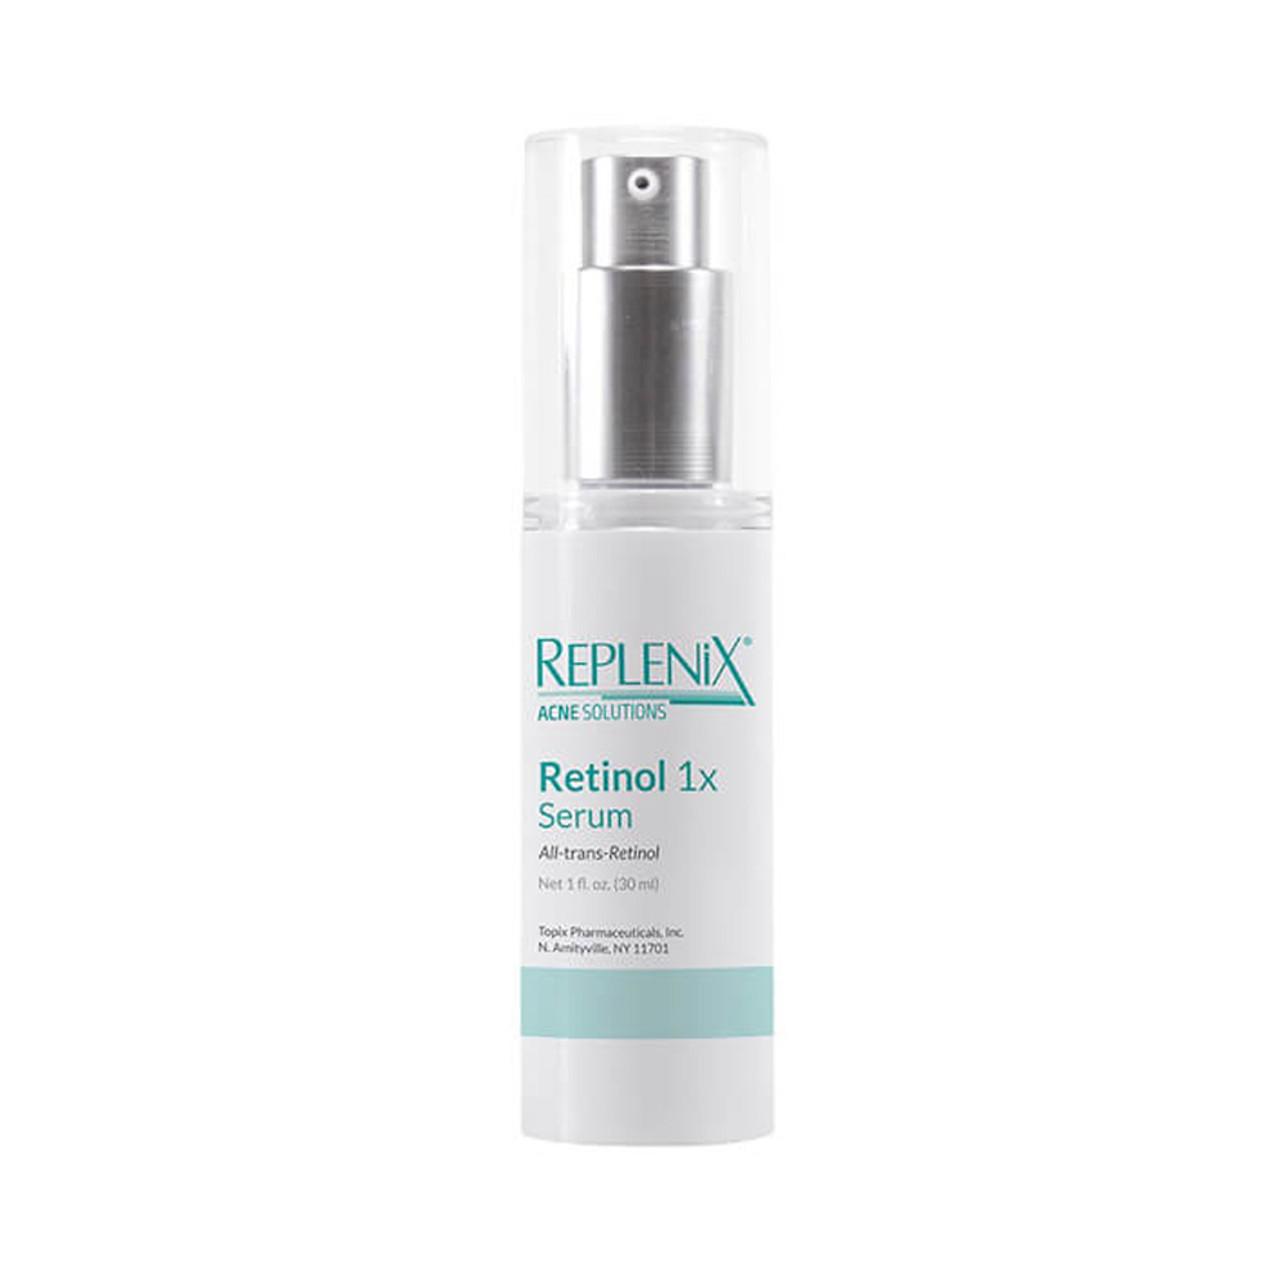 Replenix Acne Solutions All-trans-Retinol Serum 1X